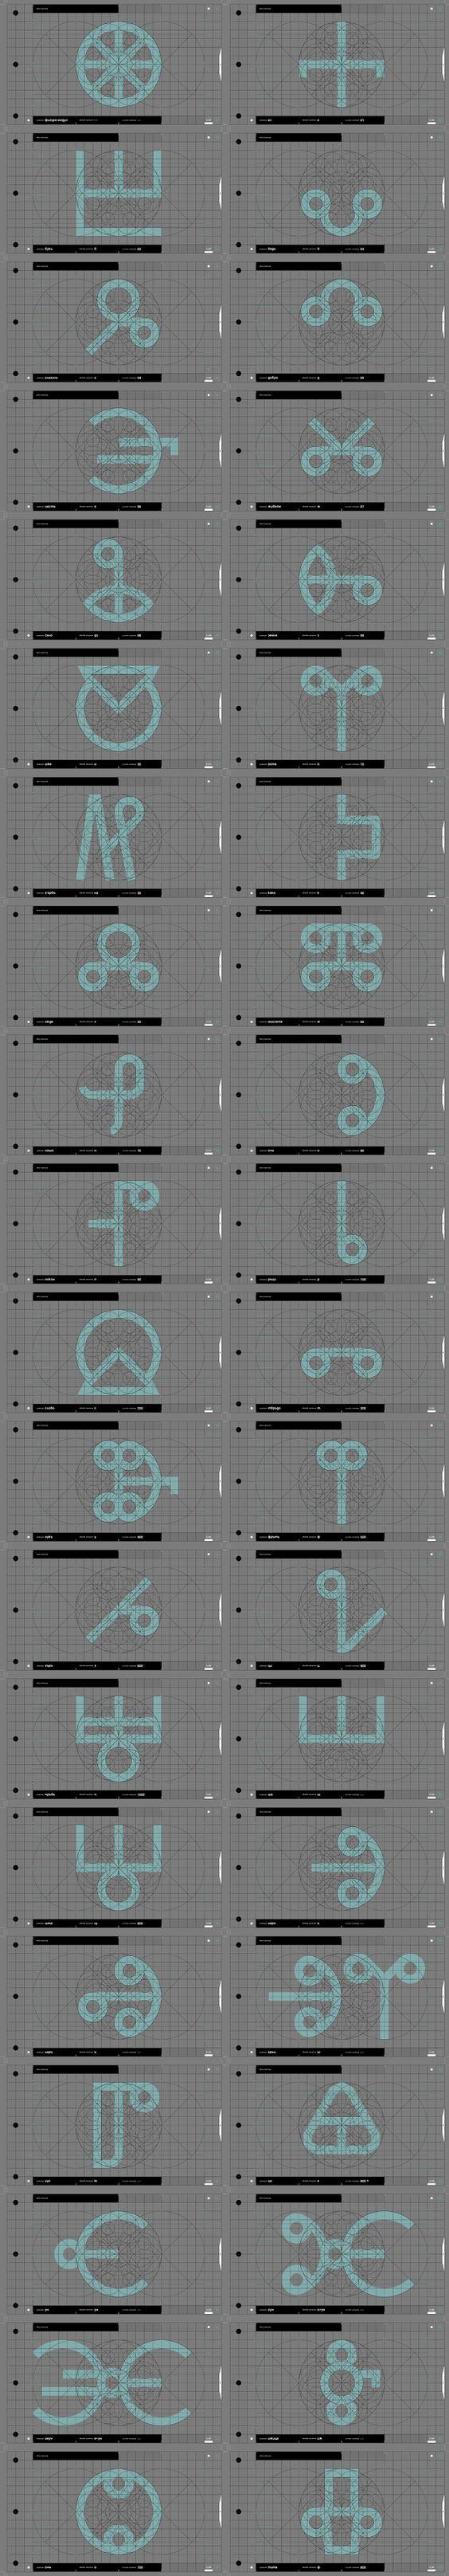 9 learn the glagolica alphabet